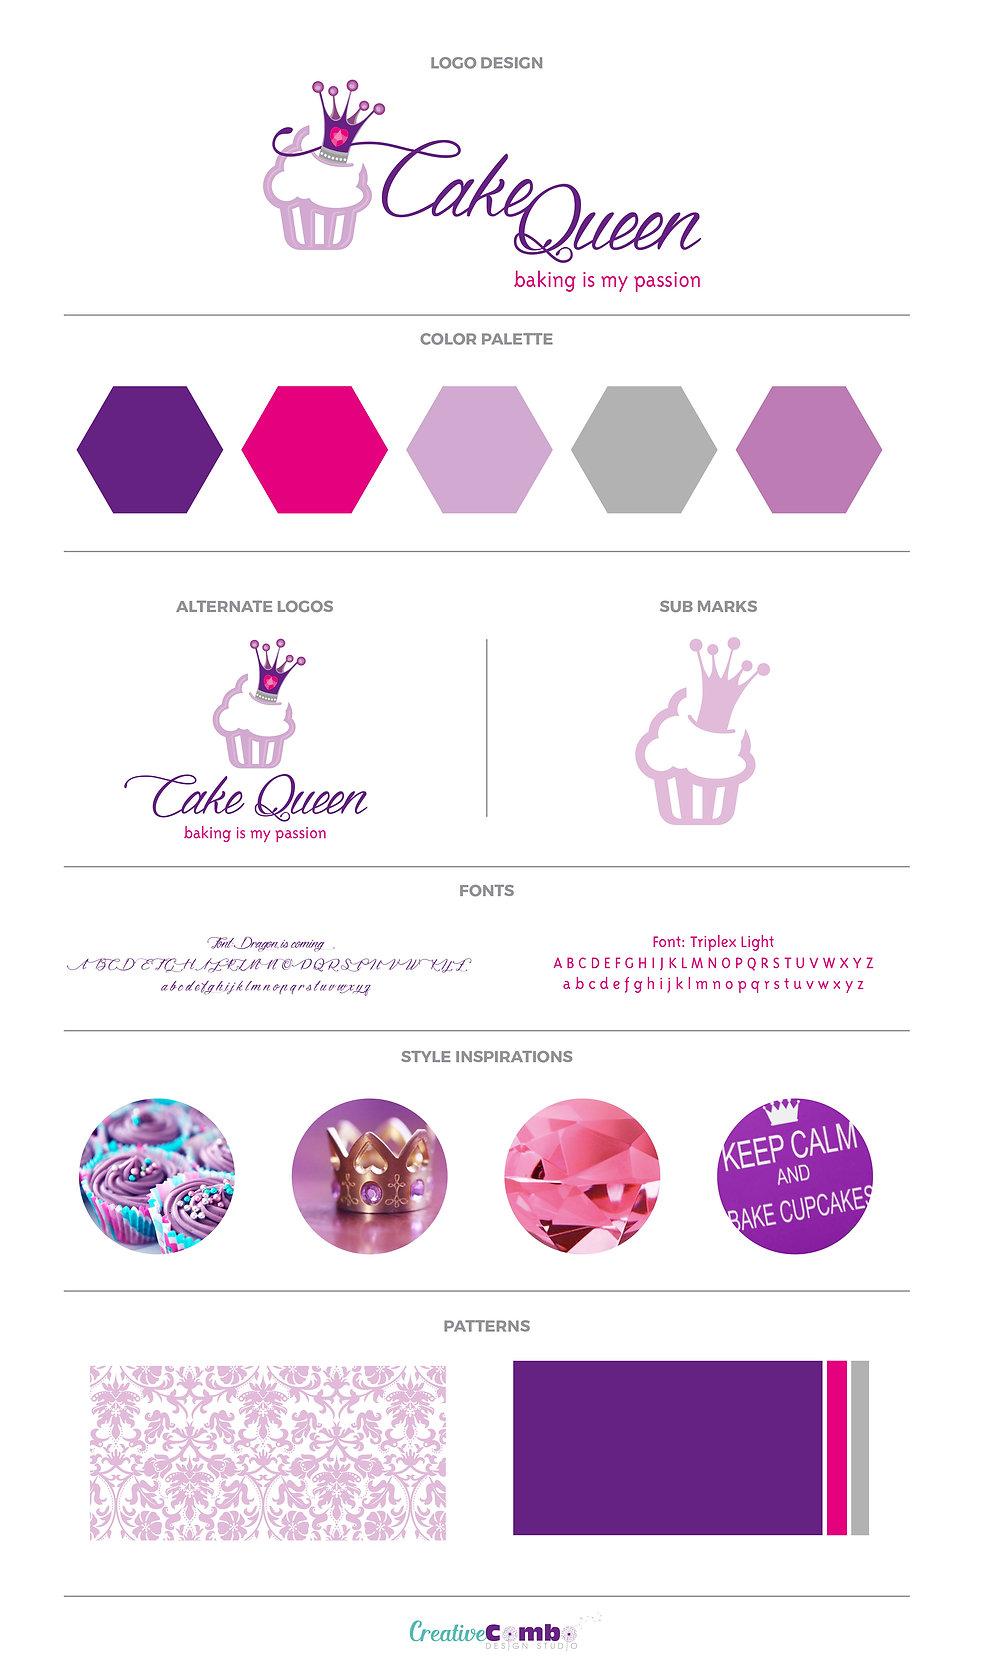 Cake Queen Company Brand Design